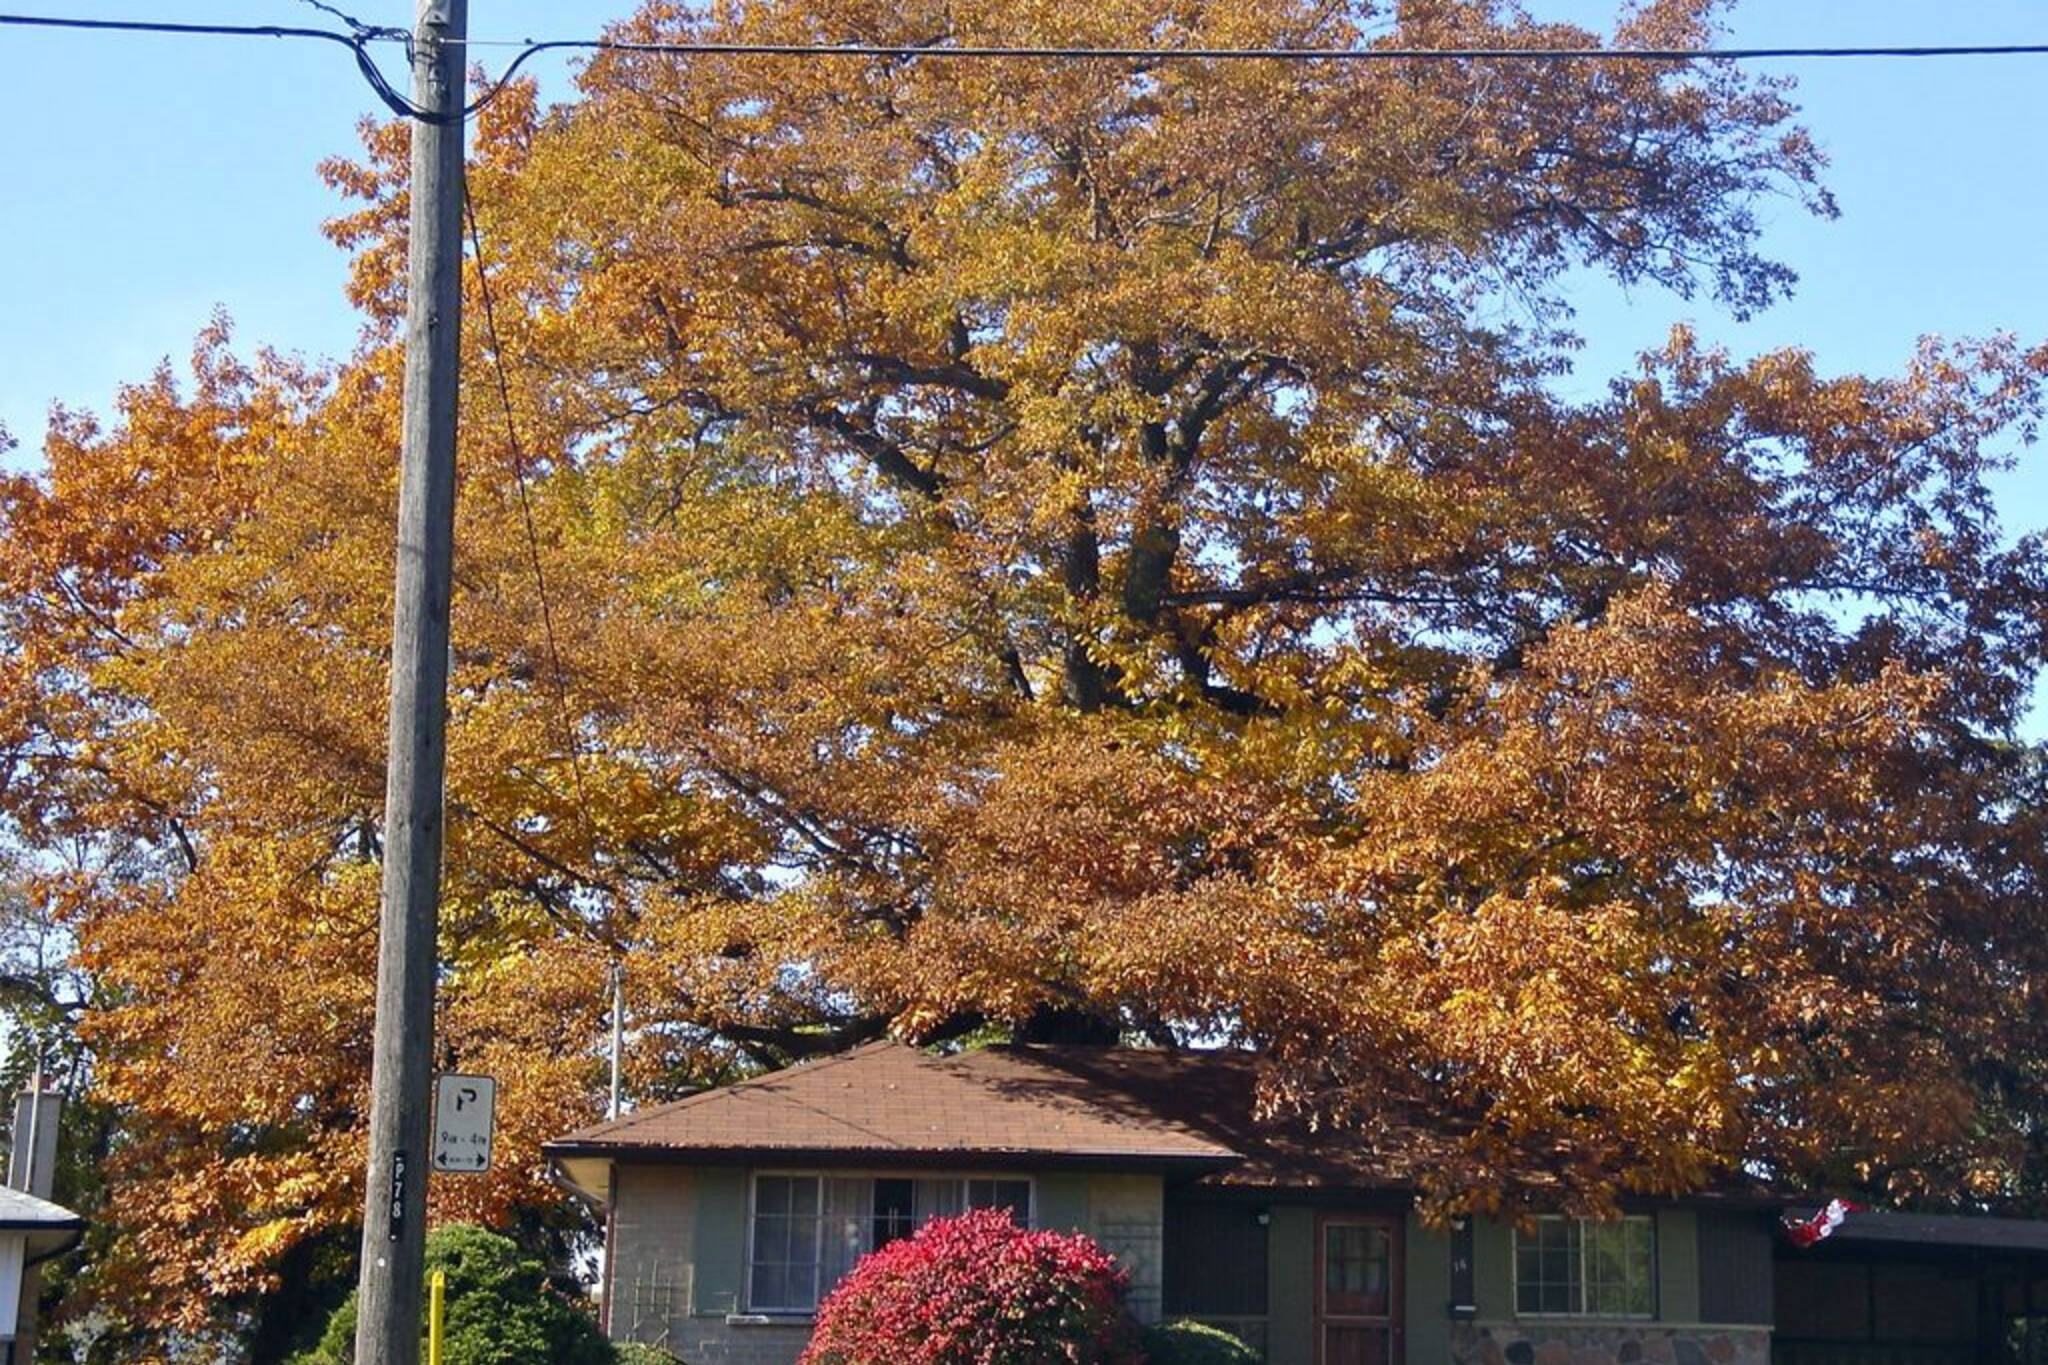 toronto old oak tree